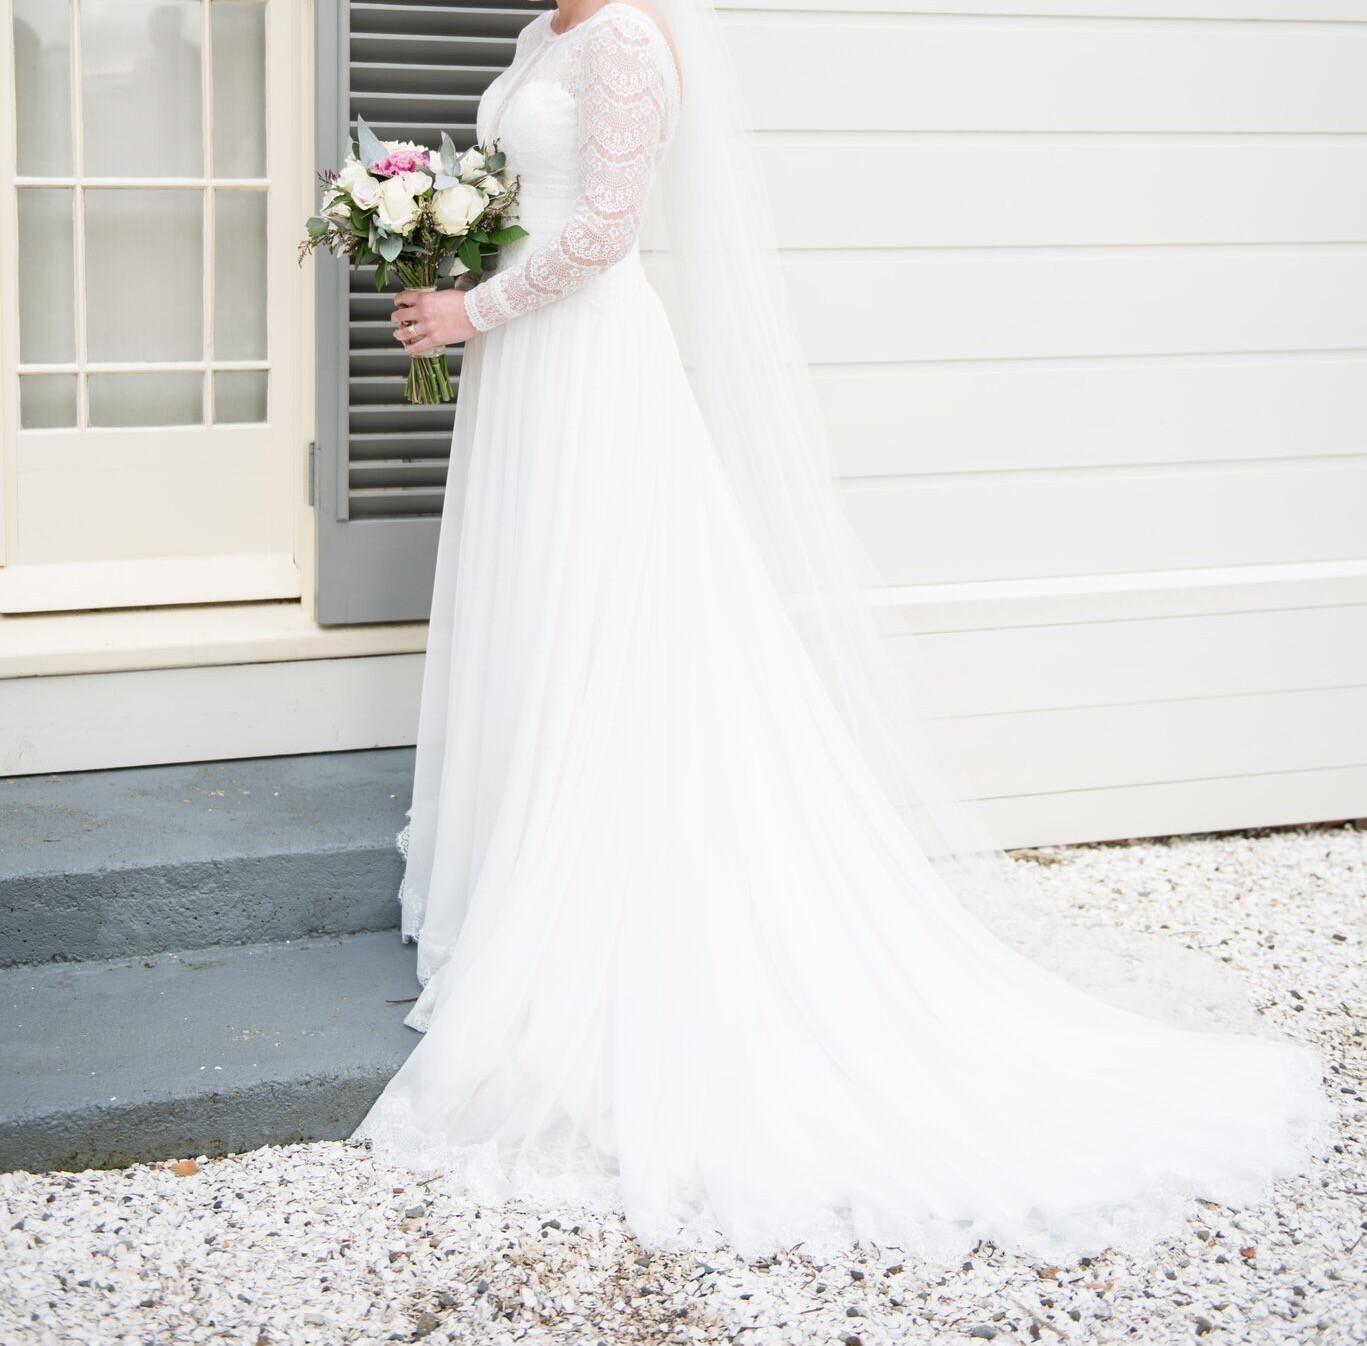 Maggie Sottero Deirdre Used Wedding Dress On Sale 38% Off